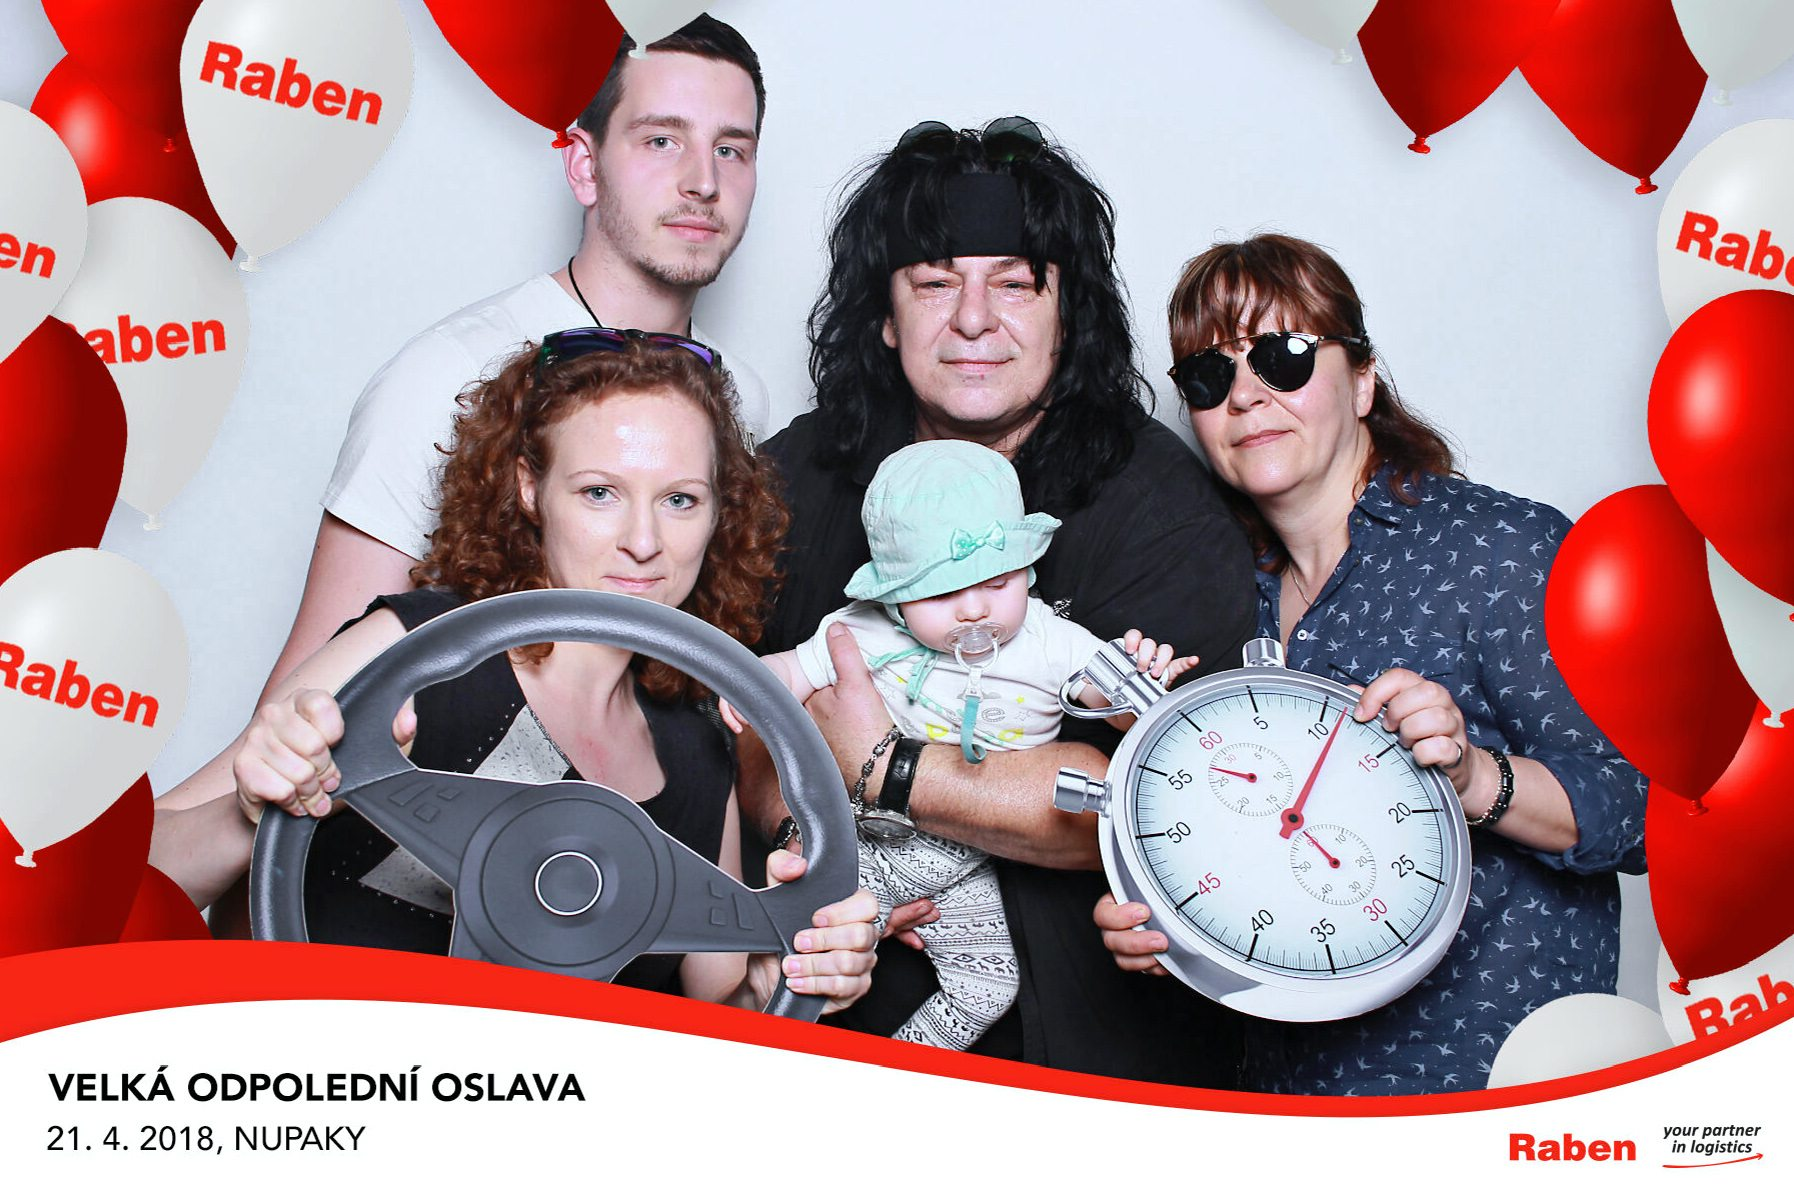 fotokoutek-brno-oslava-raben-velka-odpoledni-oslava-21-4-2018-411481